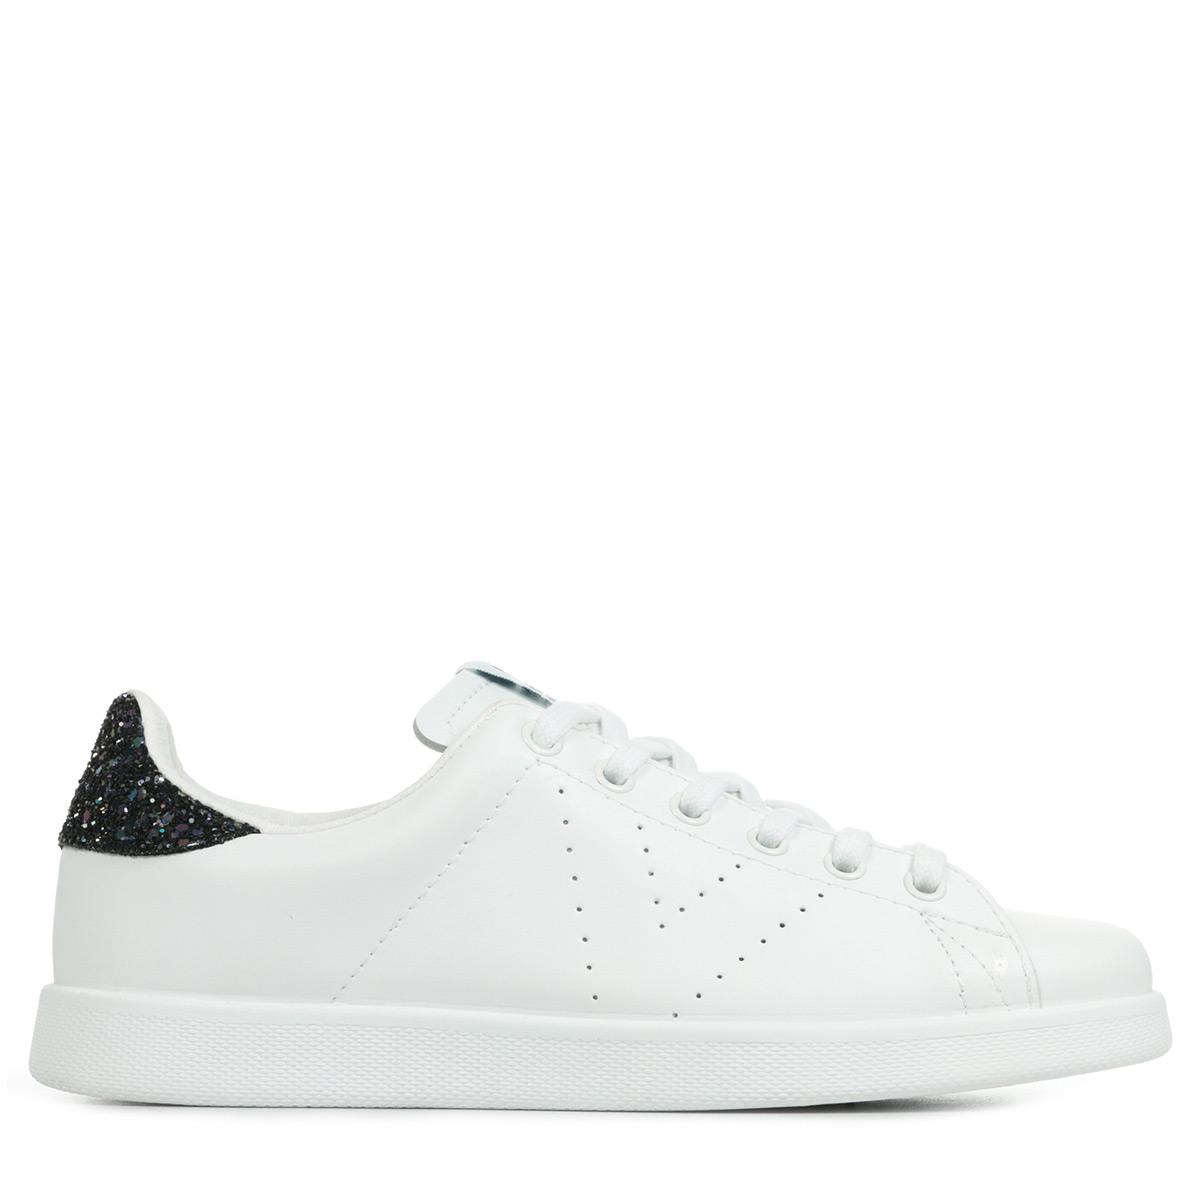 Chaussures Baskets Victoria femme 125104 Marino taille Blanc